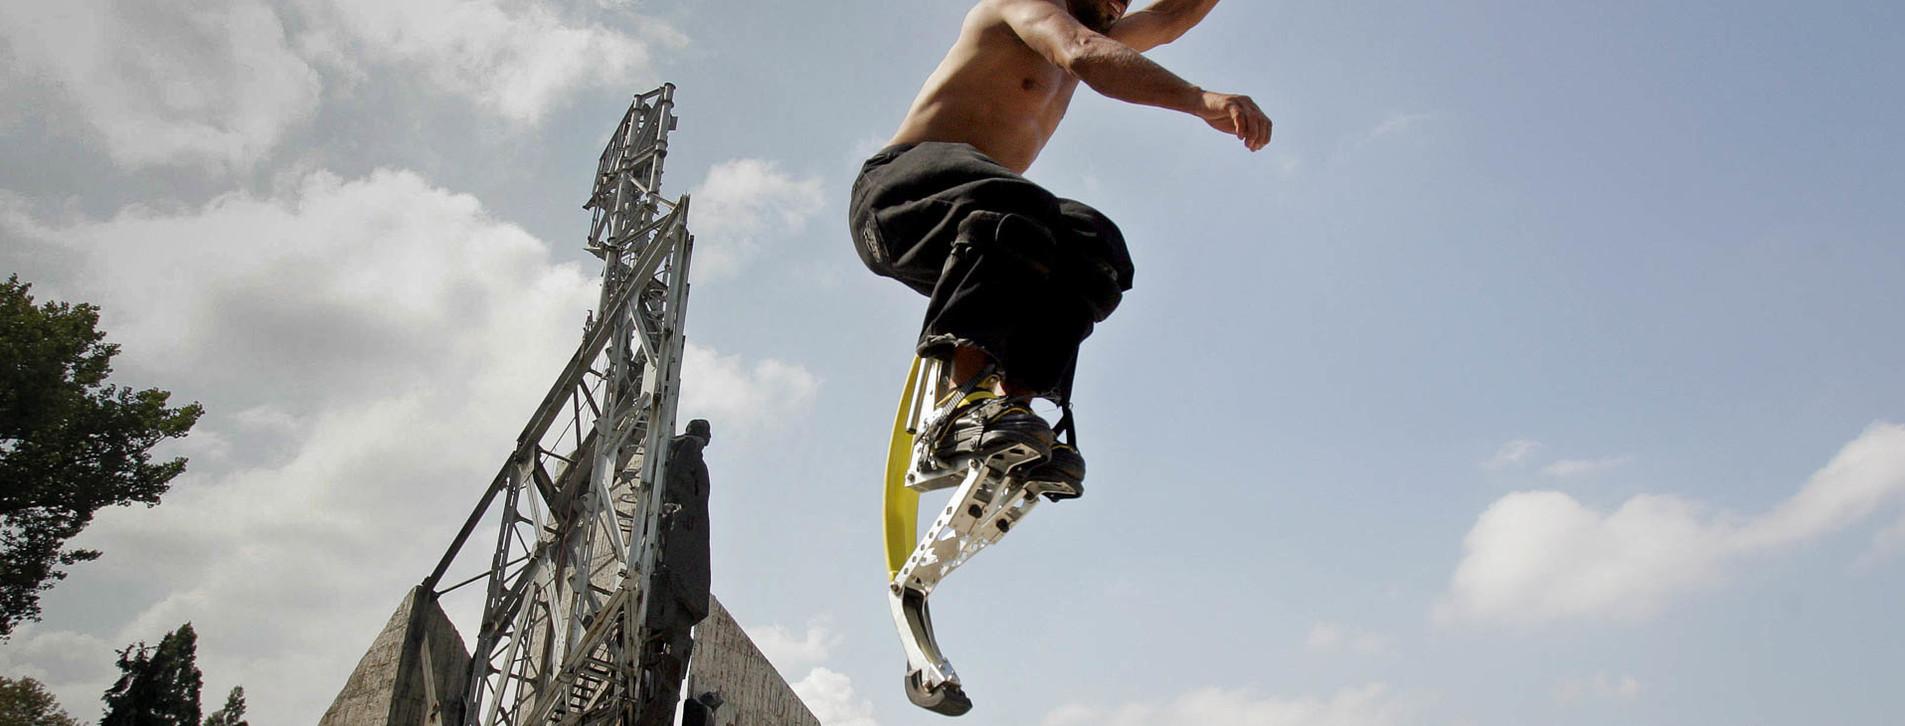 Фото 1 - Прыжки на джамперах